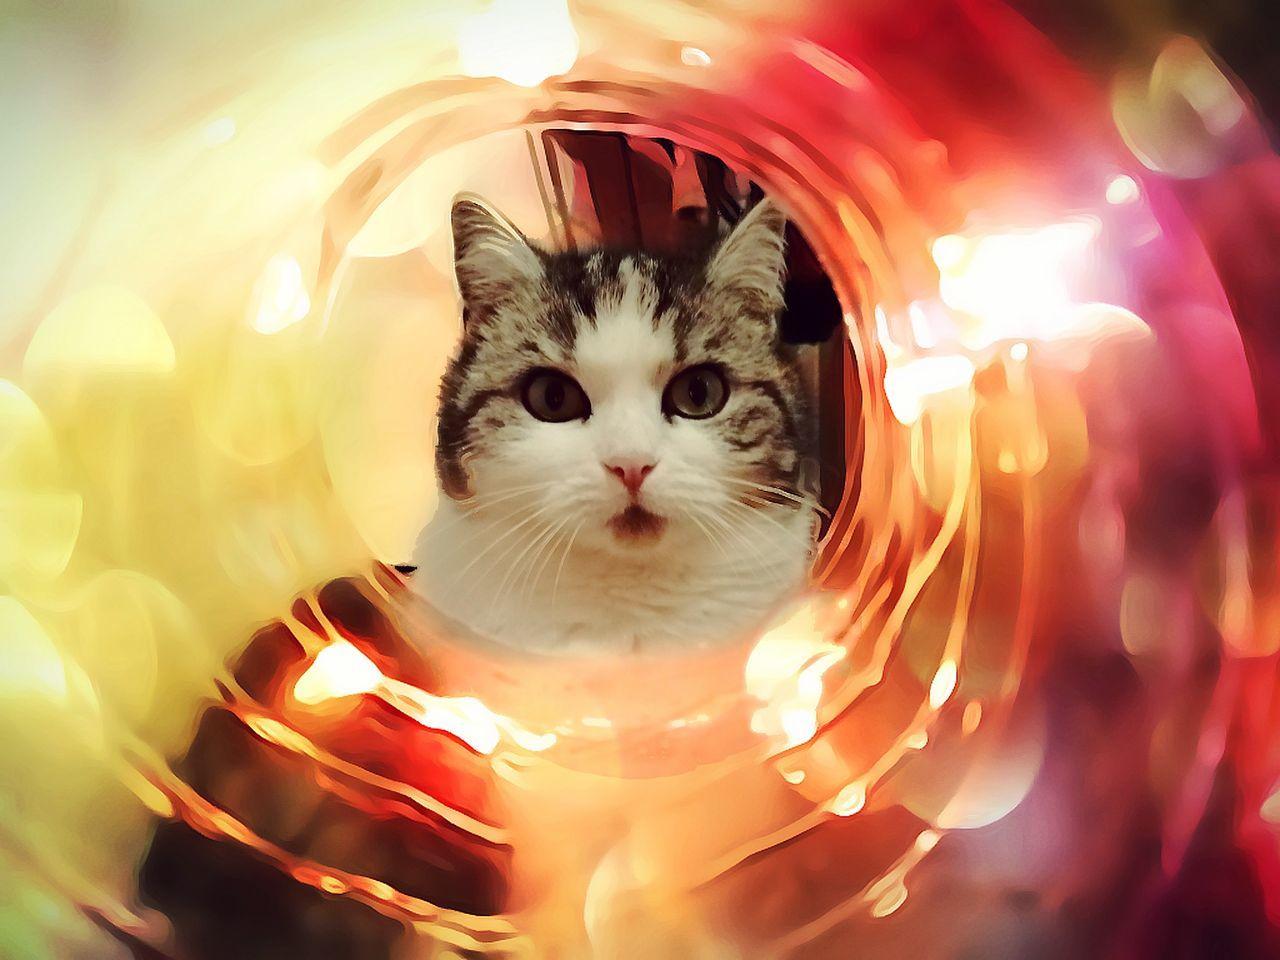 CLOSE-UP PORTRAIT OF CAT WITH ILLUMINATED LIGHTING